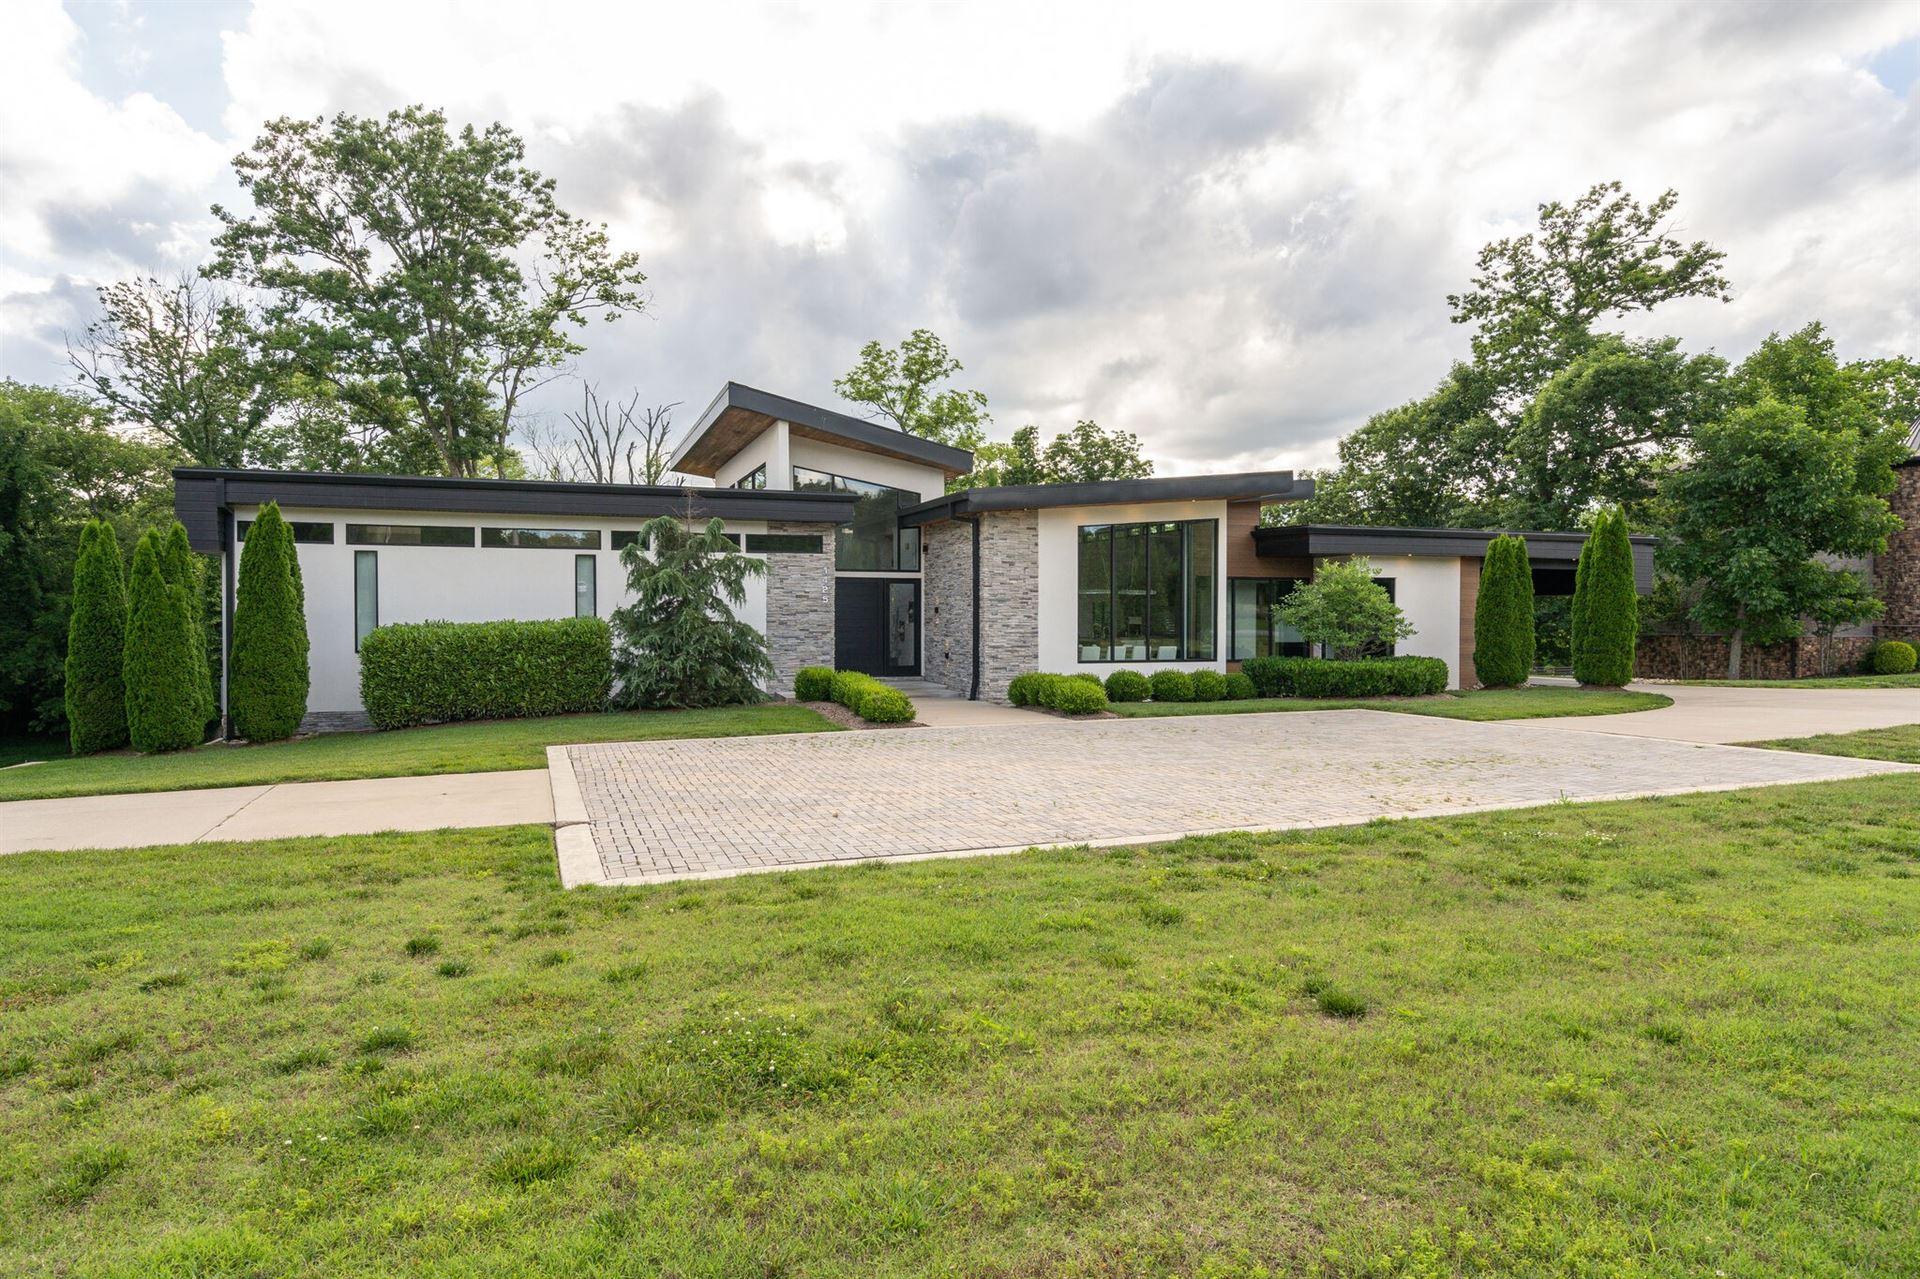 Photo of 1425 Wilson Pike, Brentwood, TN 37027 (MLS # 2261664)